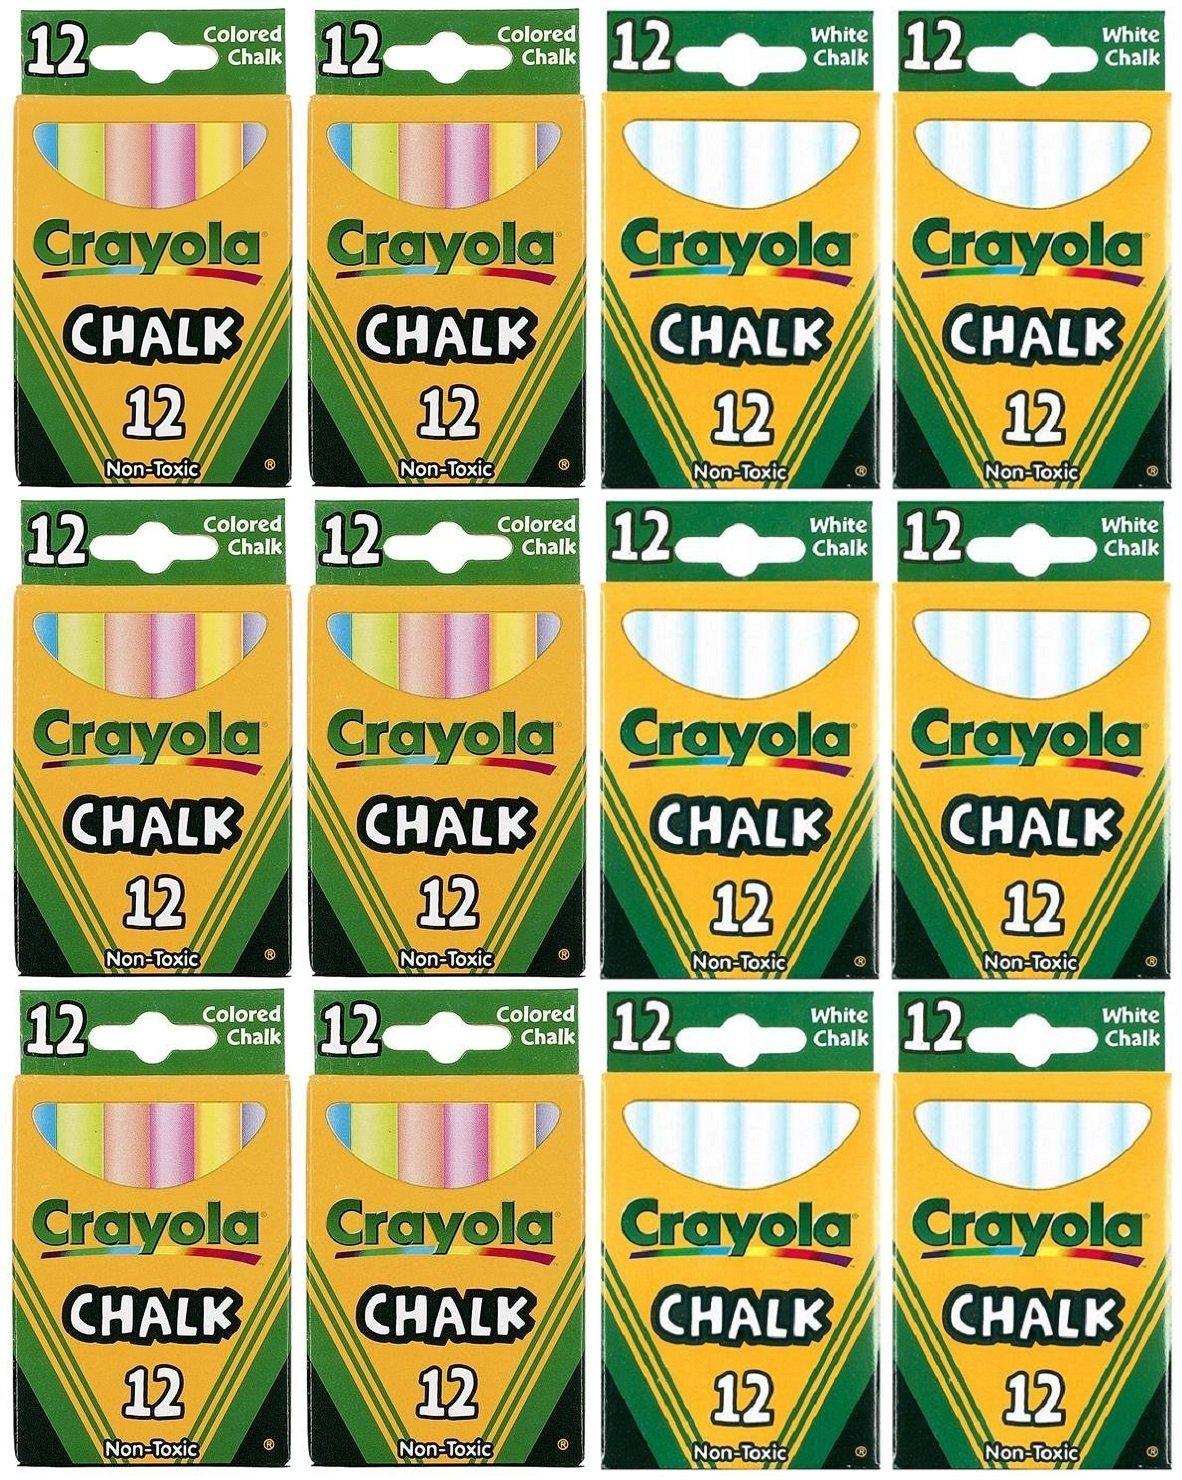 Crayola Chalk Sticks, 6 White Boxes + 6 Colored Boxes, 12 Sticks Per Box (Total 144 Chalk Sticks)